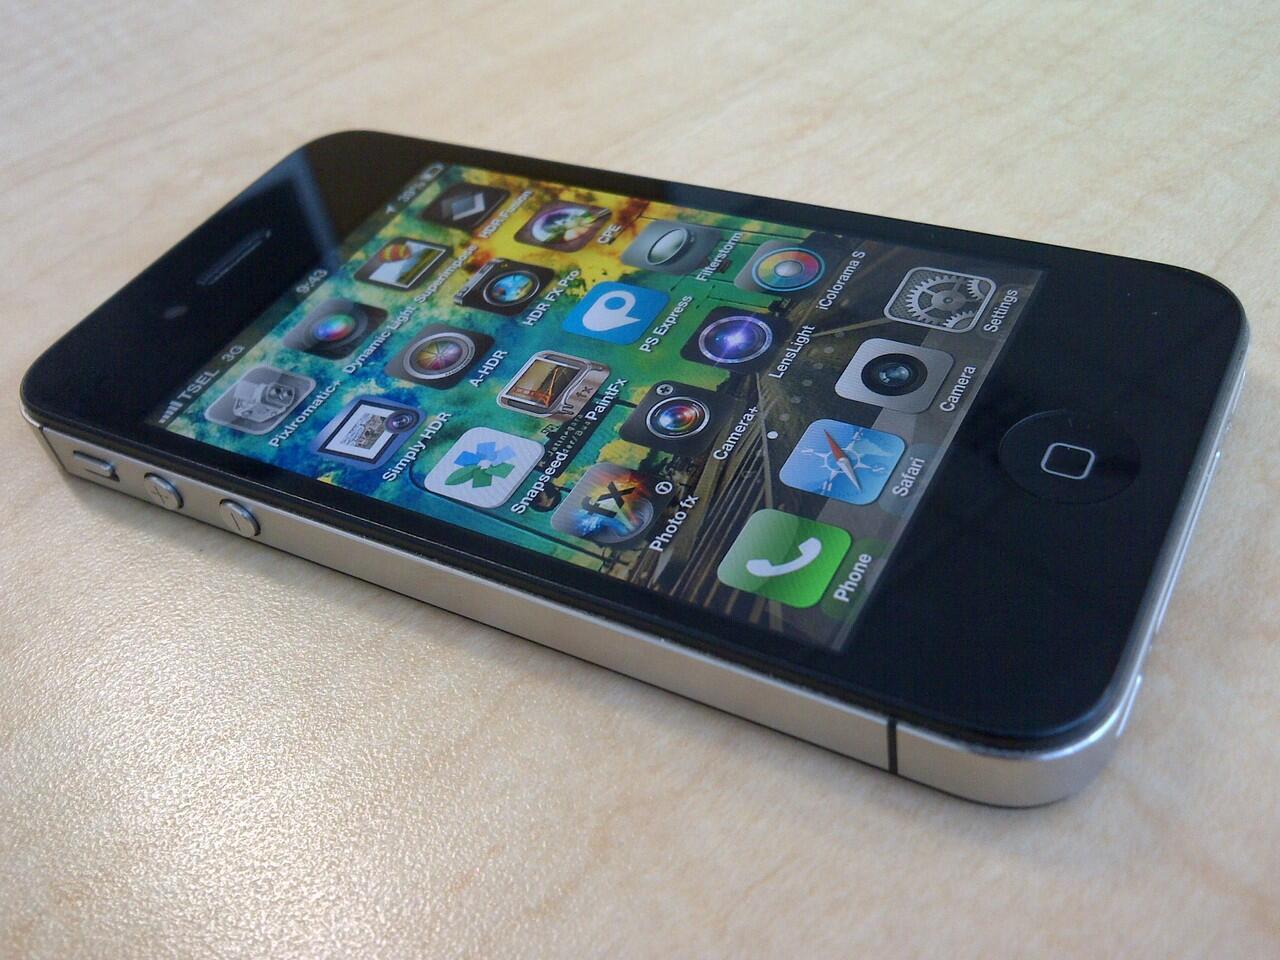 IPHONE 4S 16GB HITAM MULUS MSH GARANSI